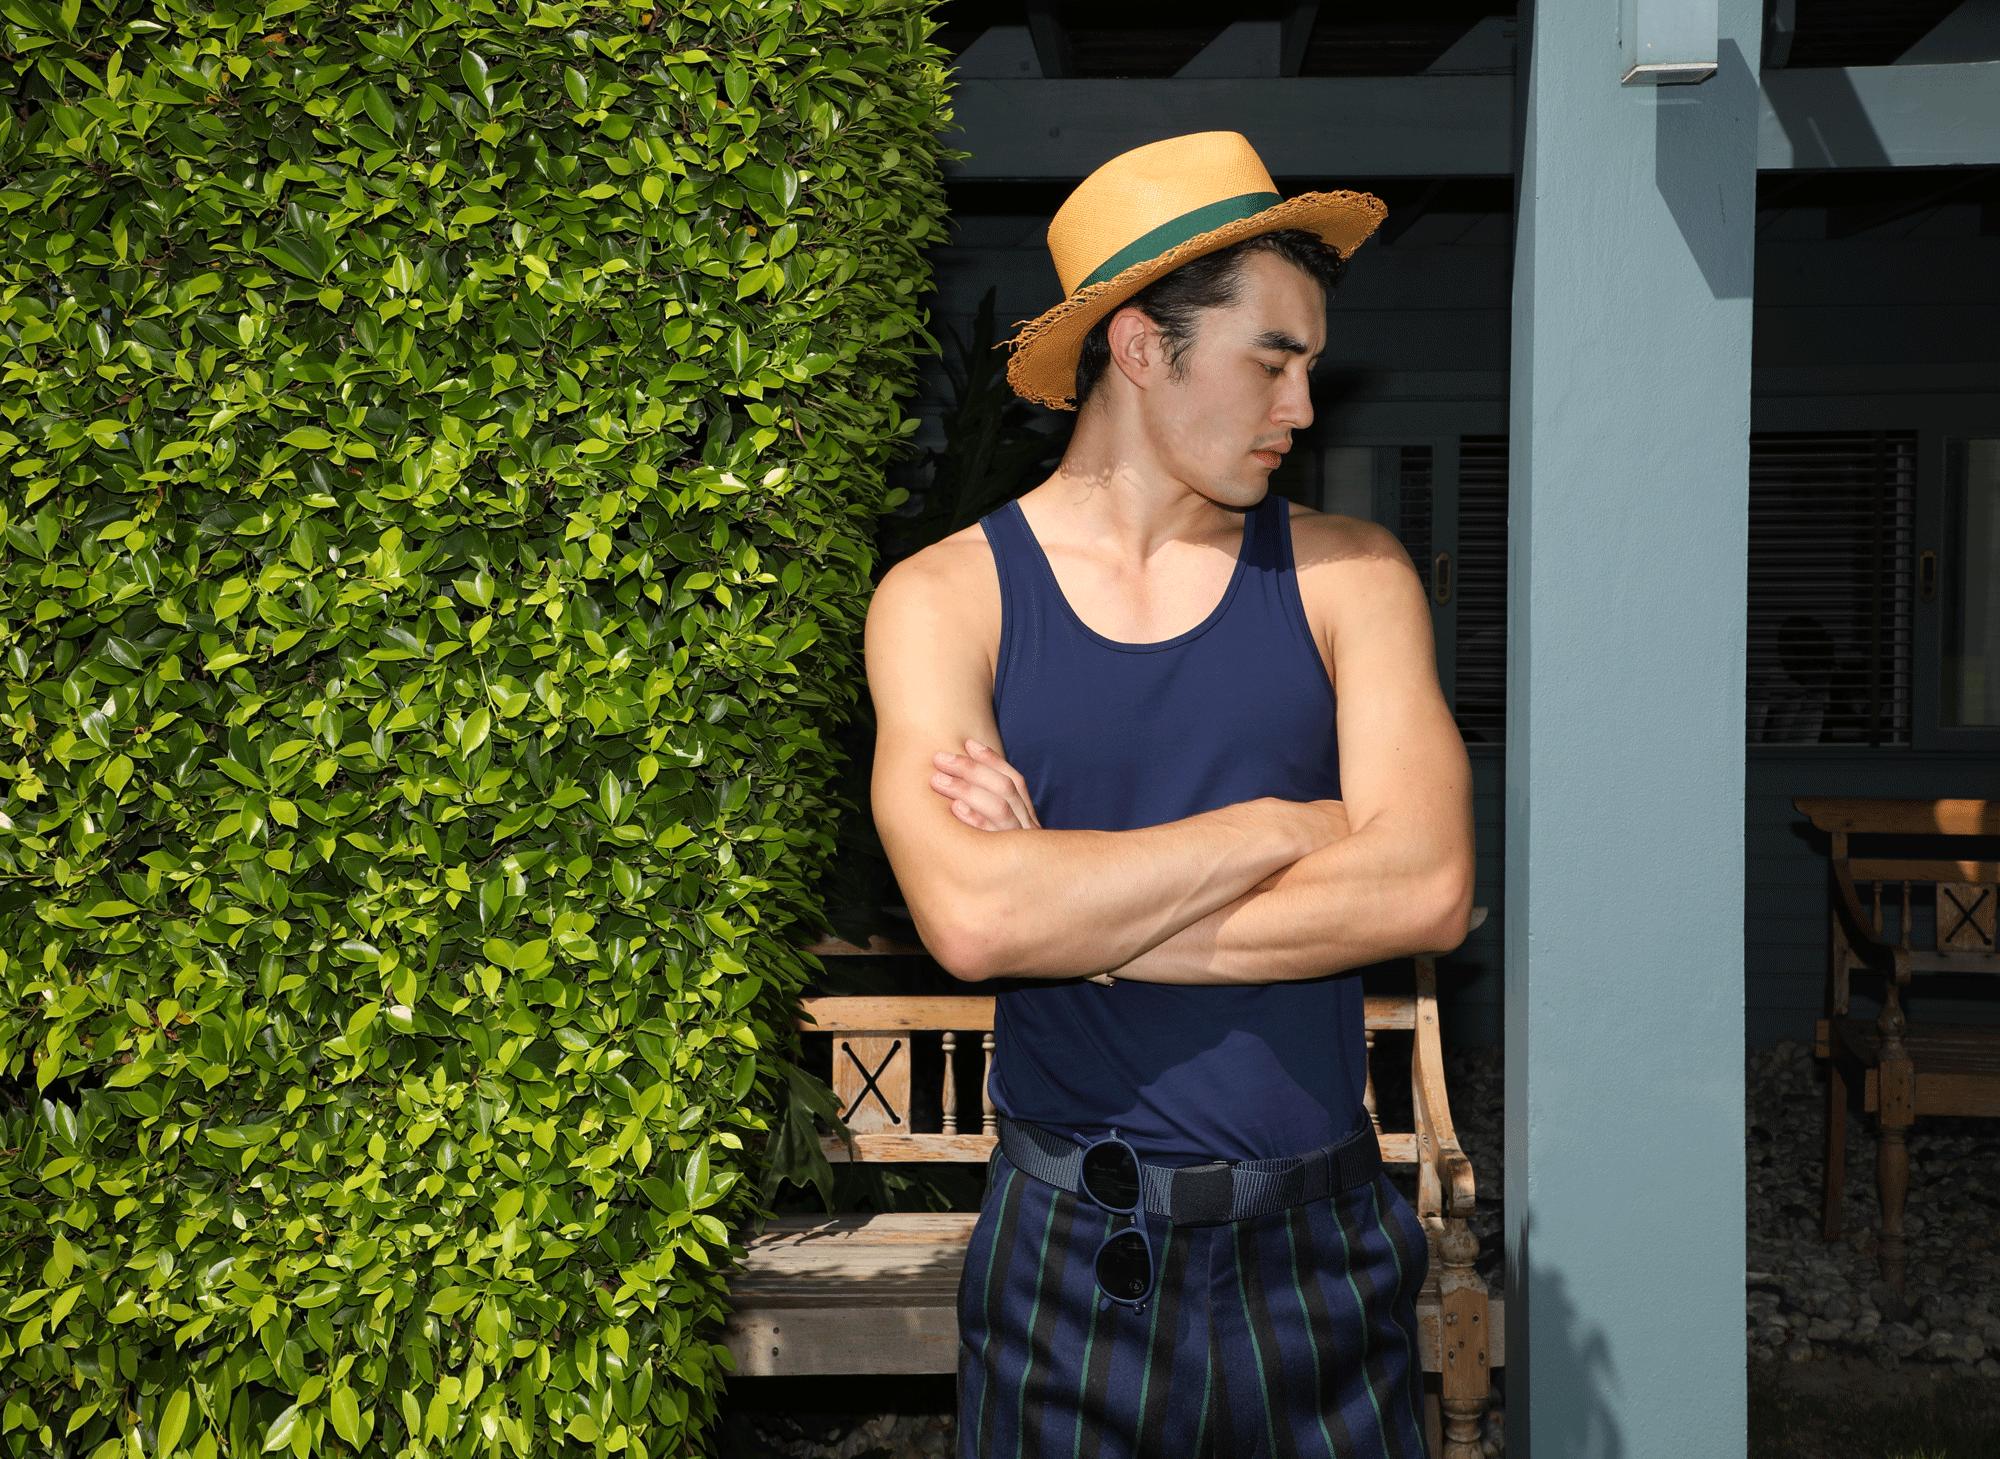 tank top : JOCKEY / shorts : Leisure Projects / hat : Famosa Andina